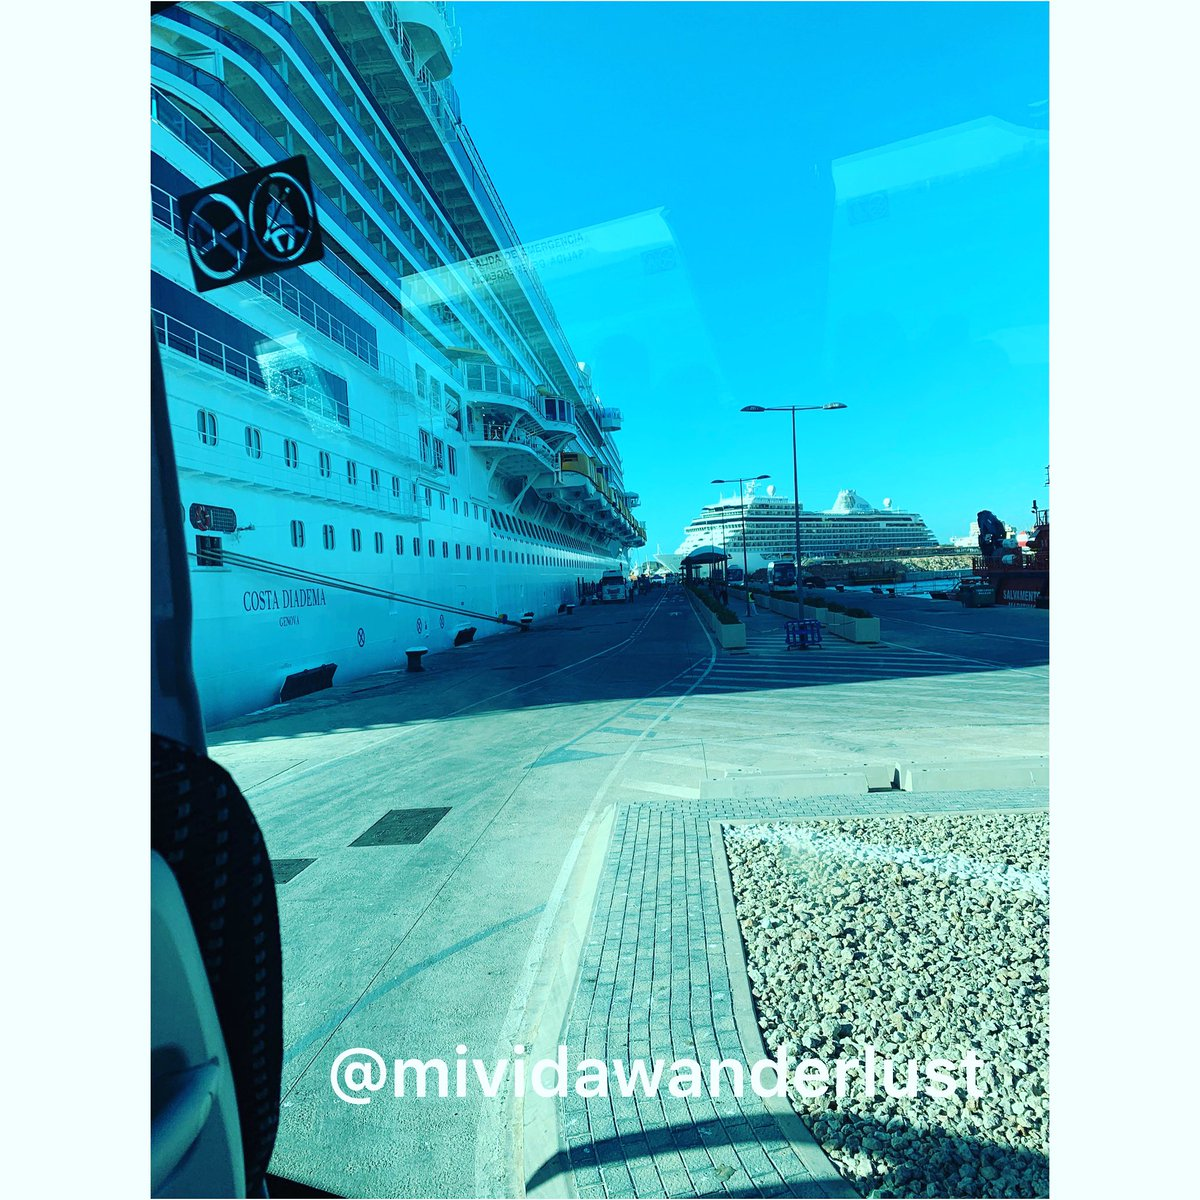 Costa Diadema docked in Palma de Mallorca #puertodepalma #Mallorca #palma #ship #cruceros #costadiadema #wanderlust #costacruceros #theholidaywemiss https://t.co/ixvWtyRHiK